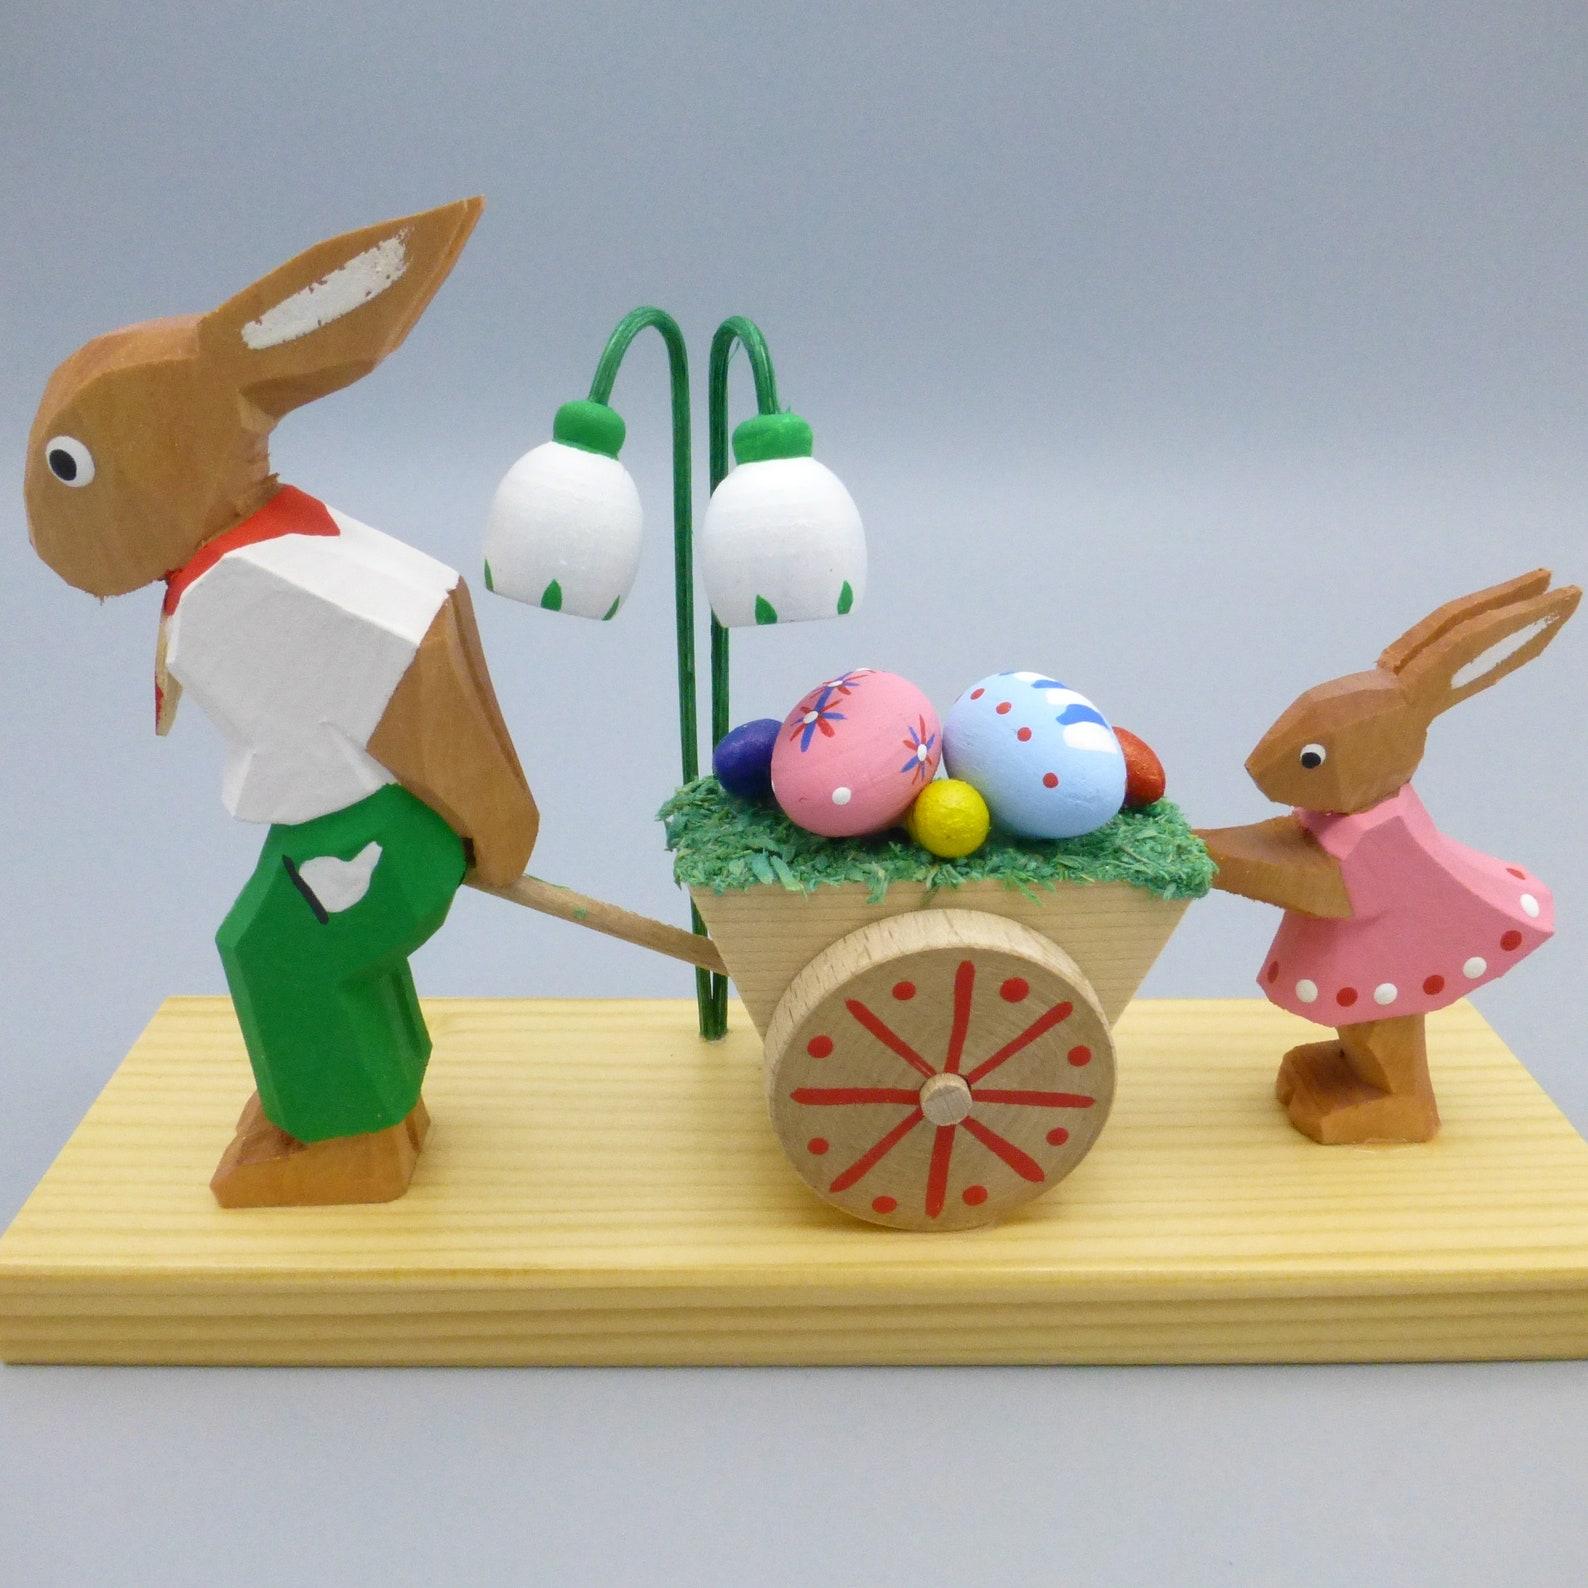 Vintage Erzgebirge Wood Easter Bunny Rabbit with Egg Cart Figurine Decoration Germany